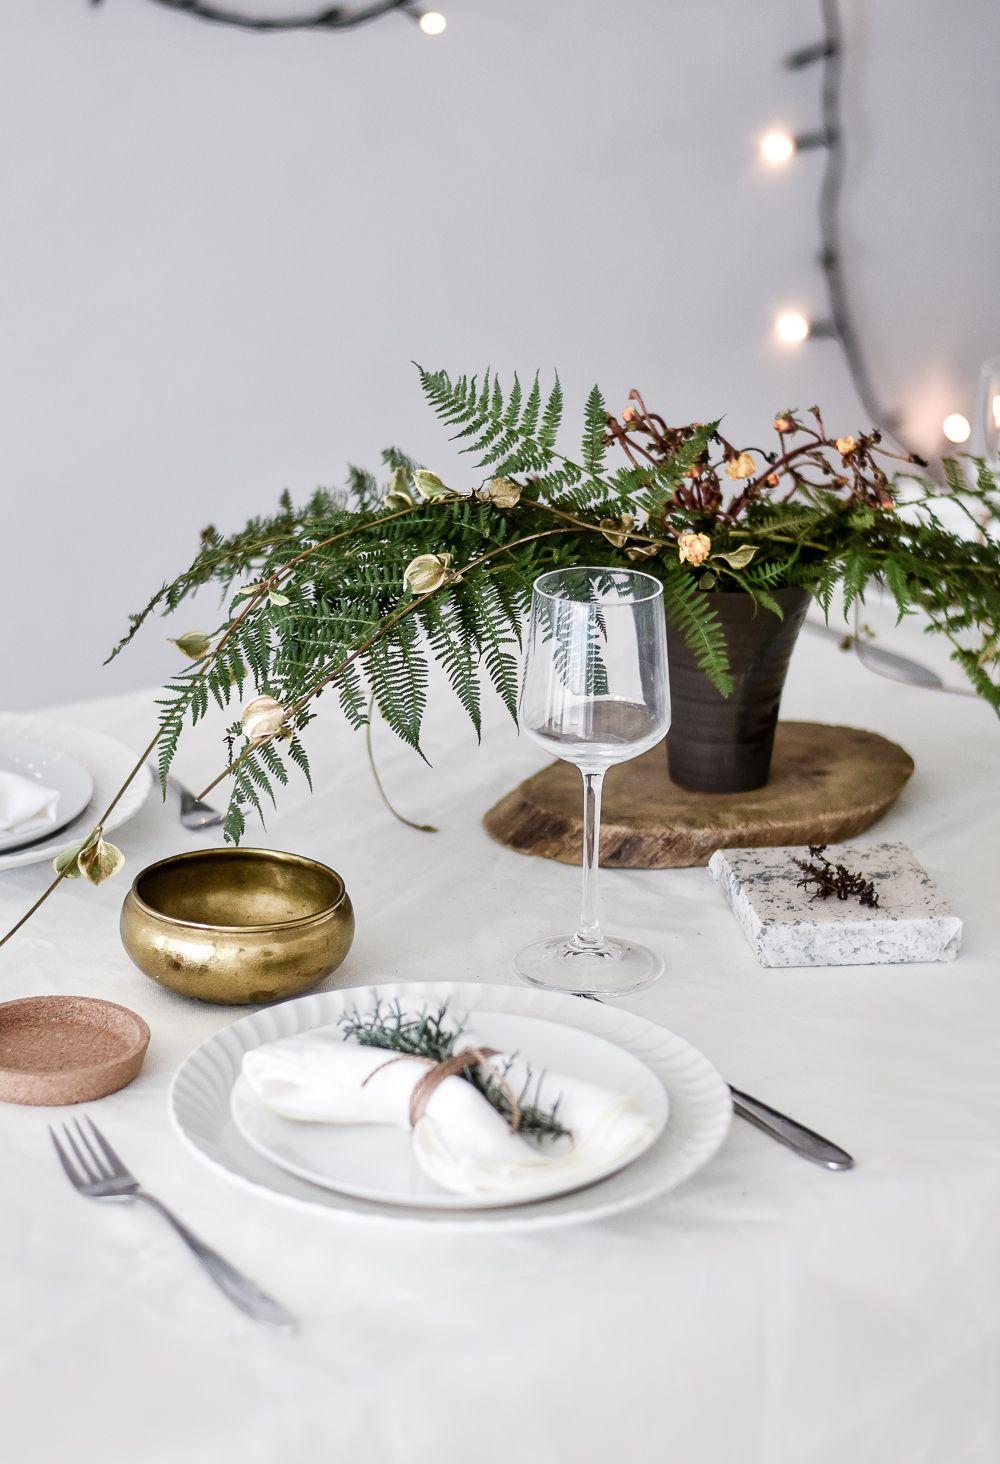 Green Festive Table Styling Centerpiece